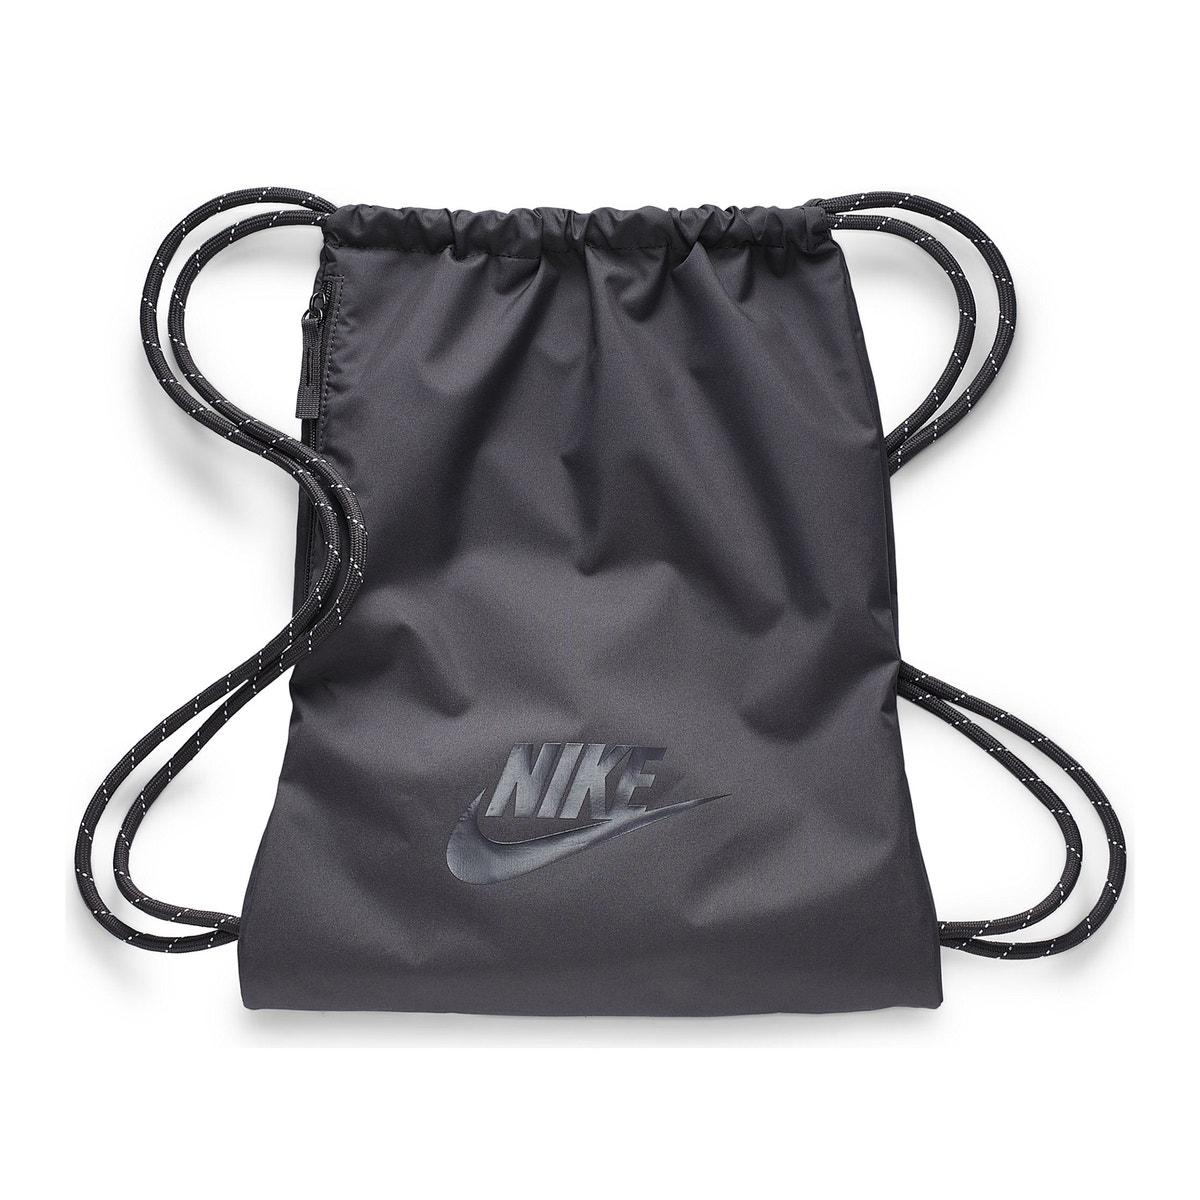 Nike - Σακίδιο πλάτης με κορδόνι, Heritage 2.0 350180560 - 3...